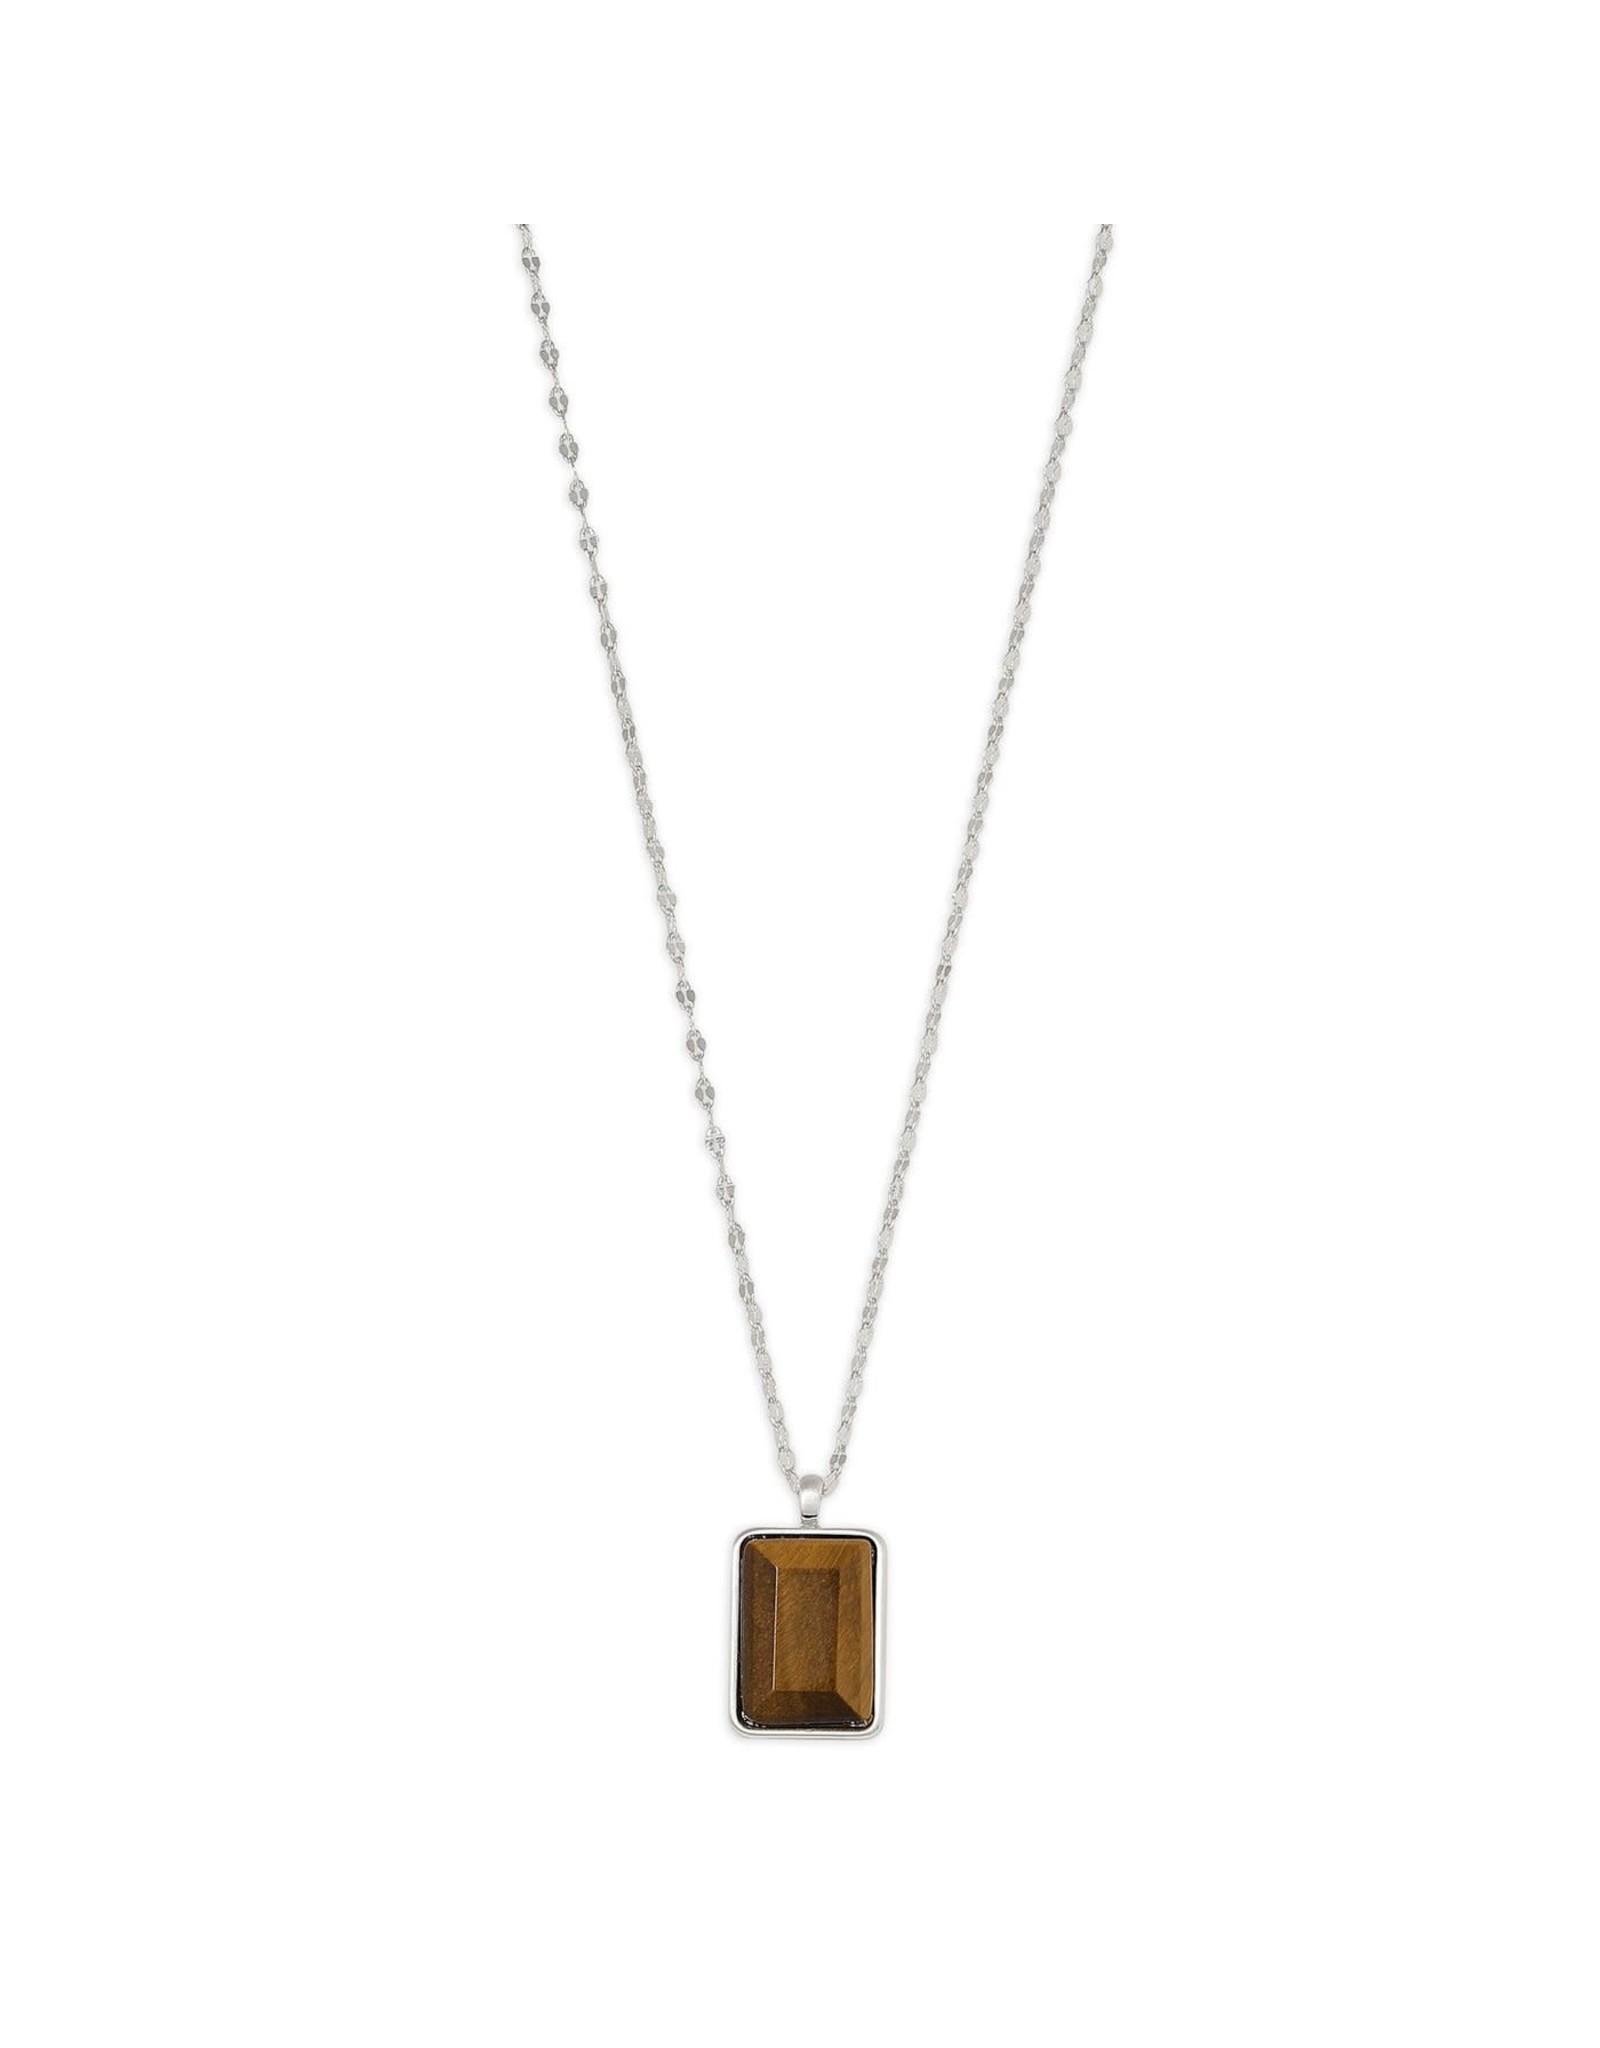 Pilgrim Pilgrim Verdandi Necklace Silver Plated Brown